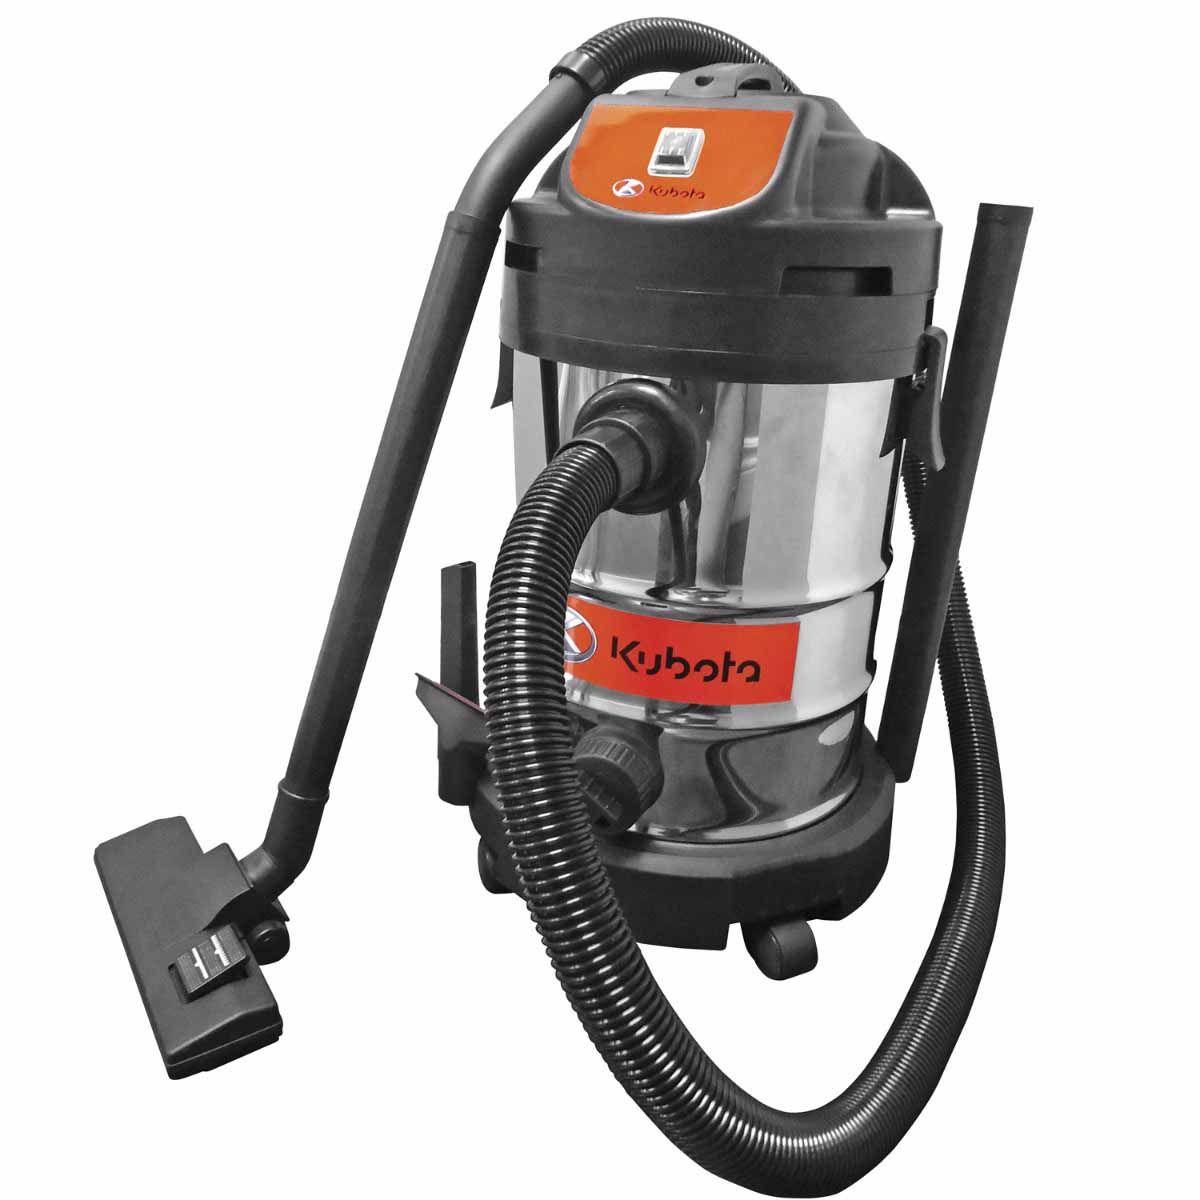 Kubota 8 Gallon Stainless Steel Vacuum